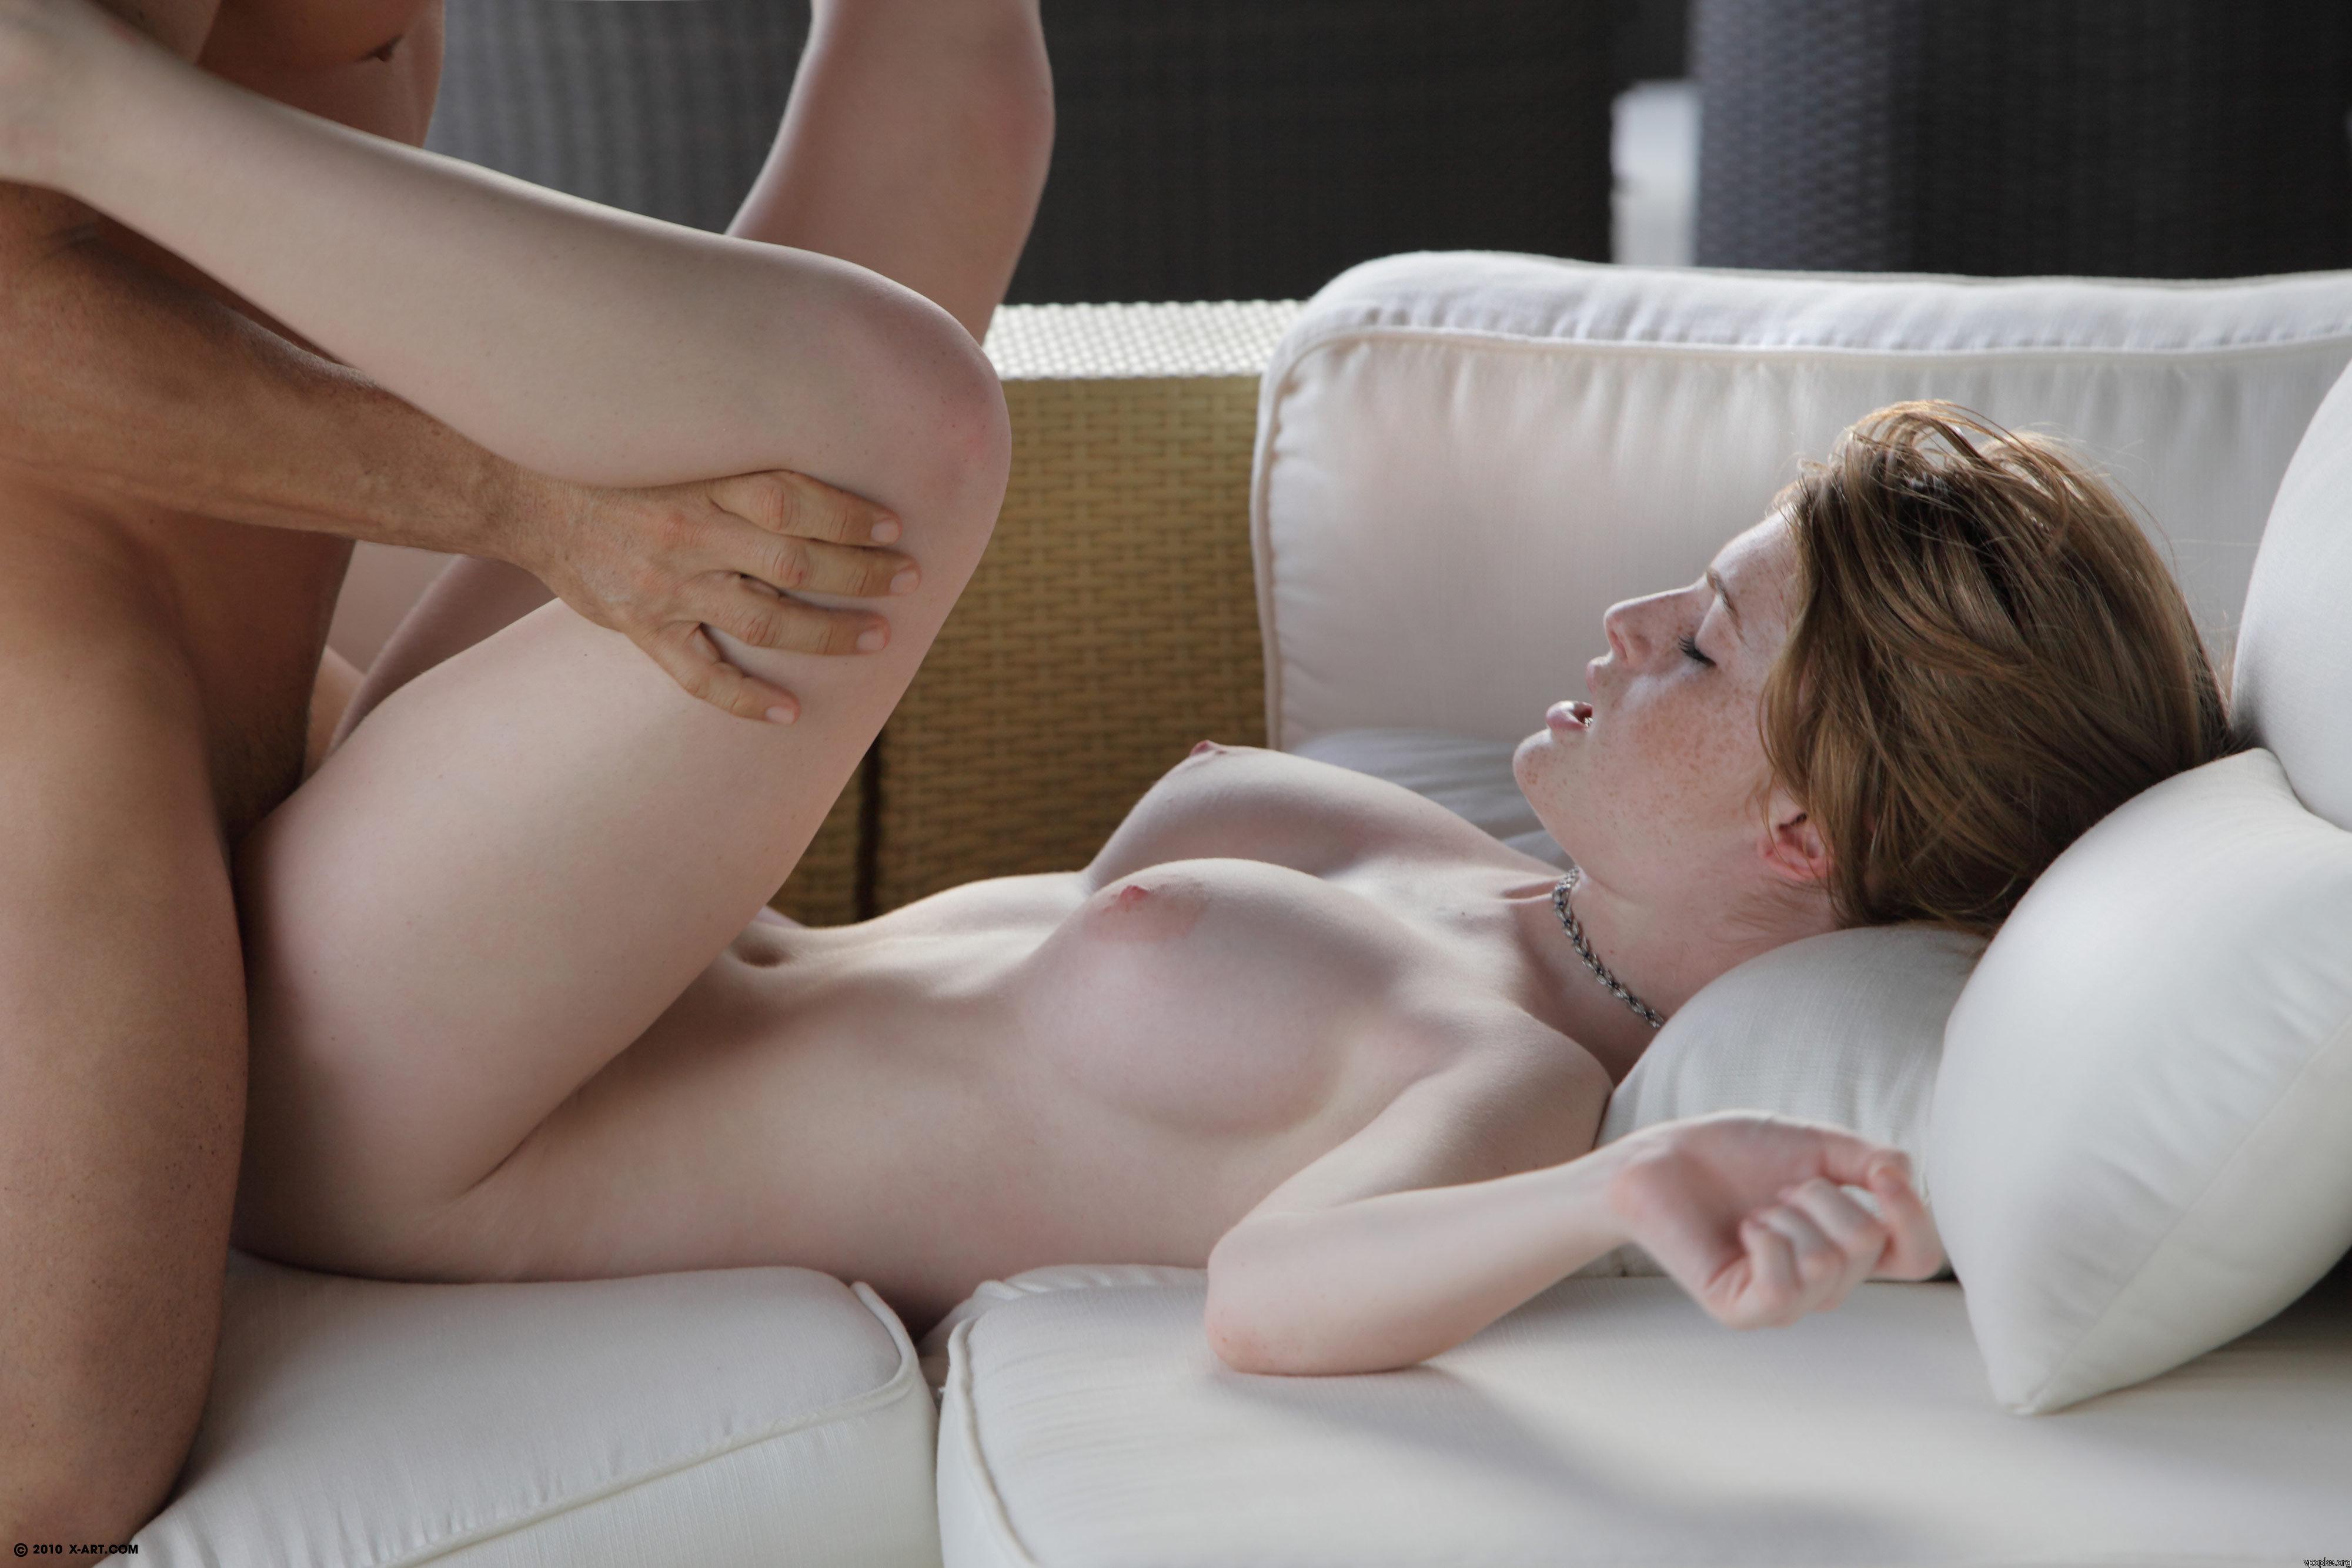 S pix xxx 3gpmovie pics naked movie